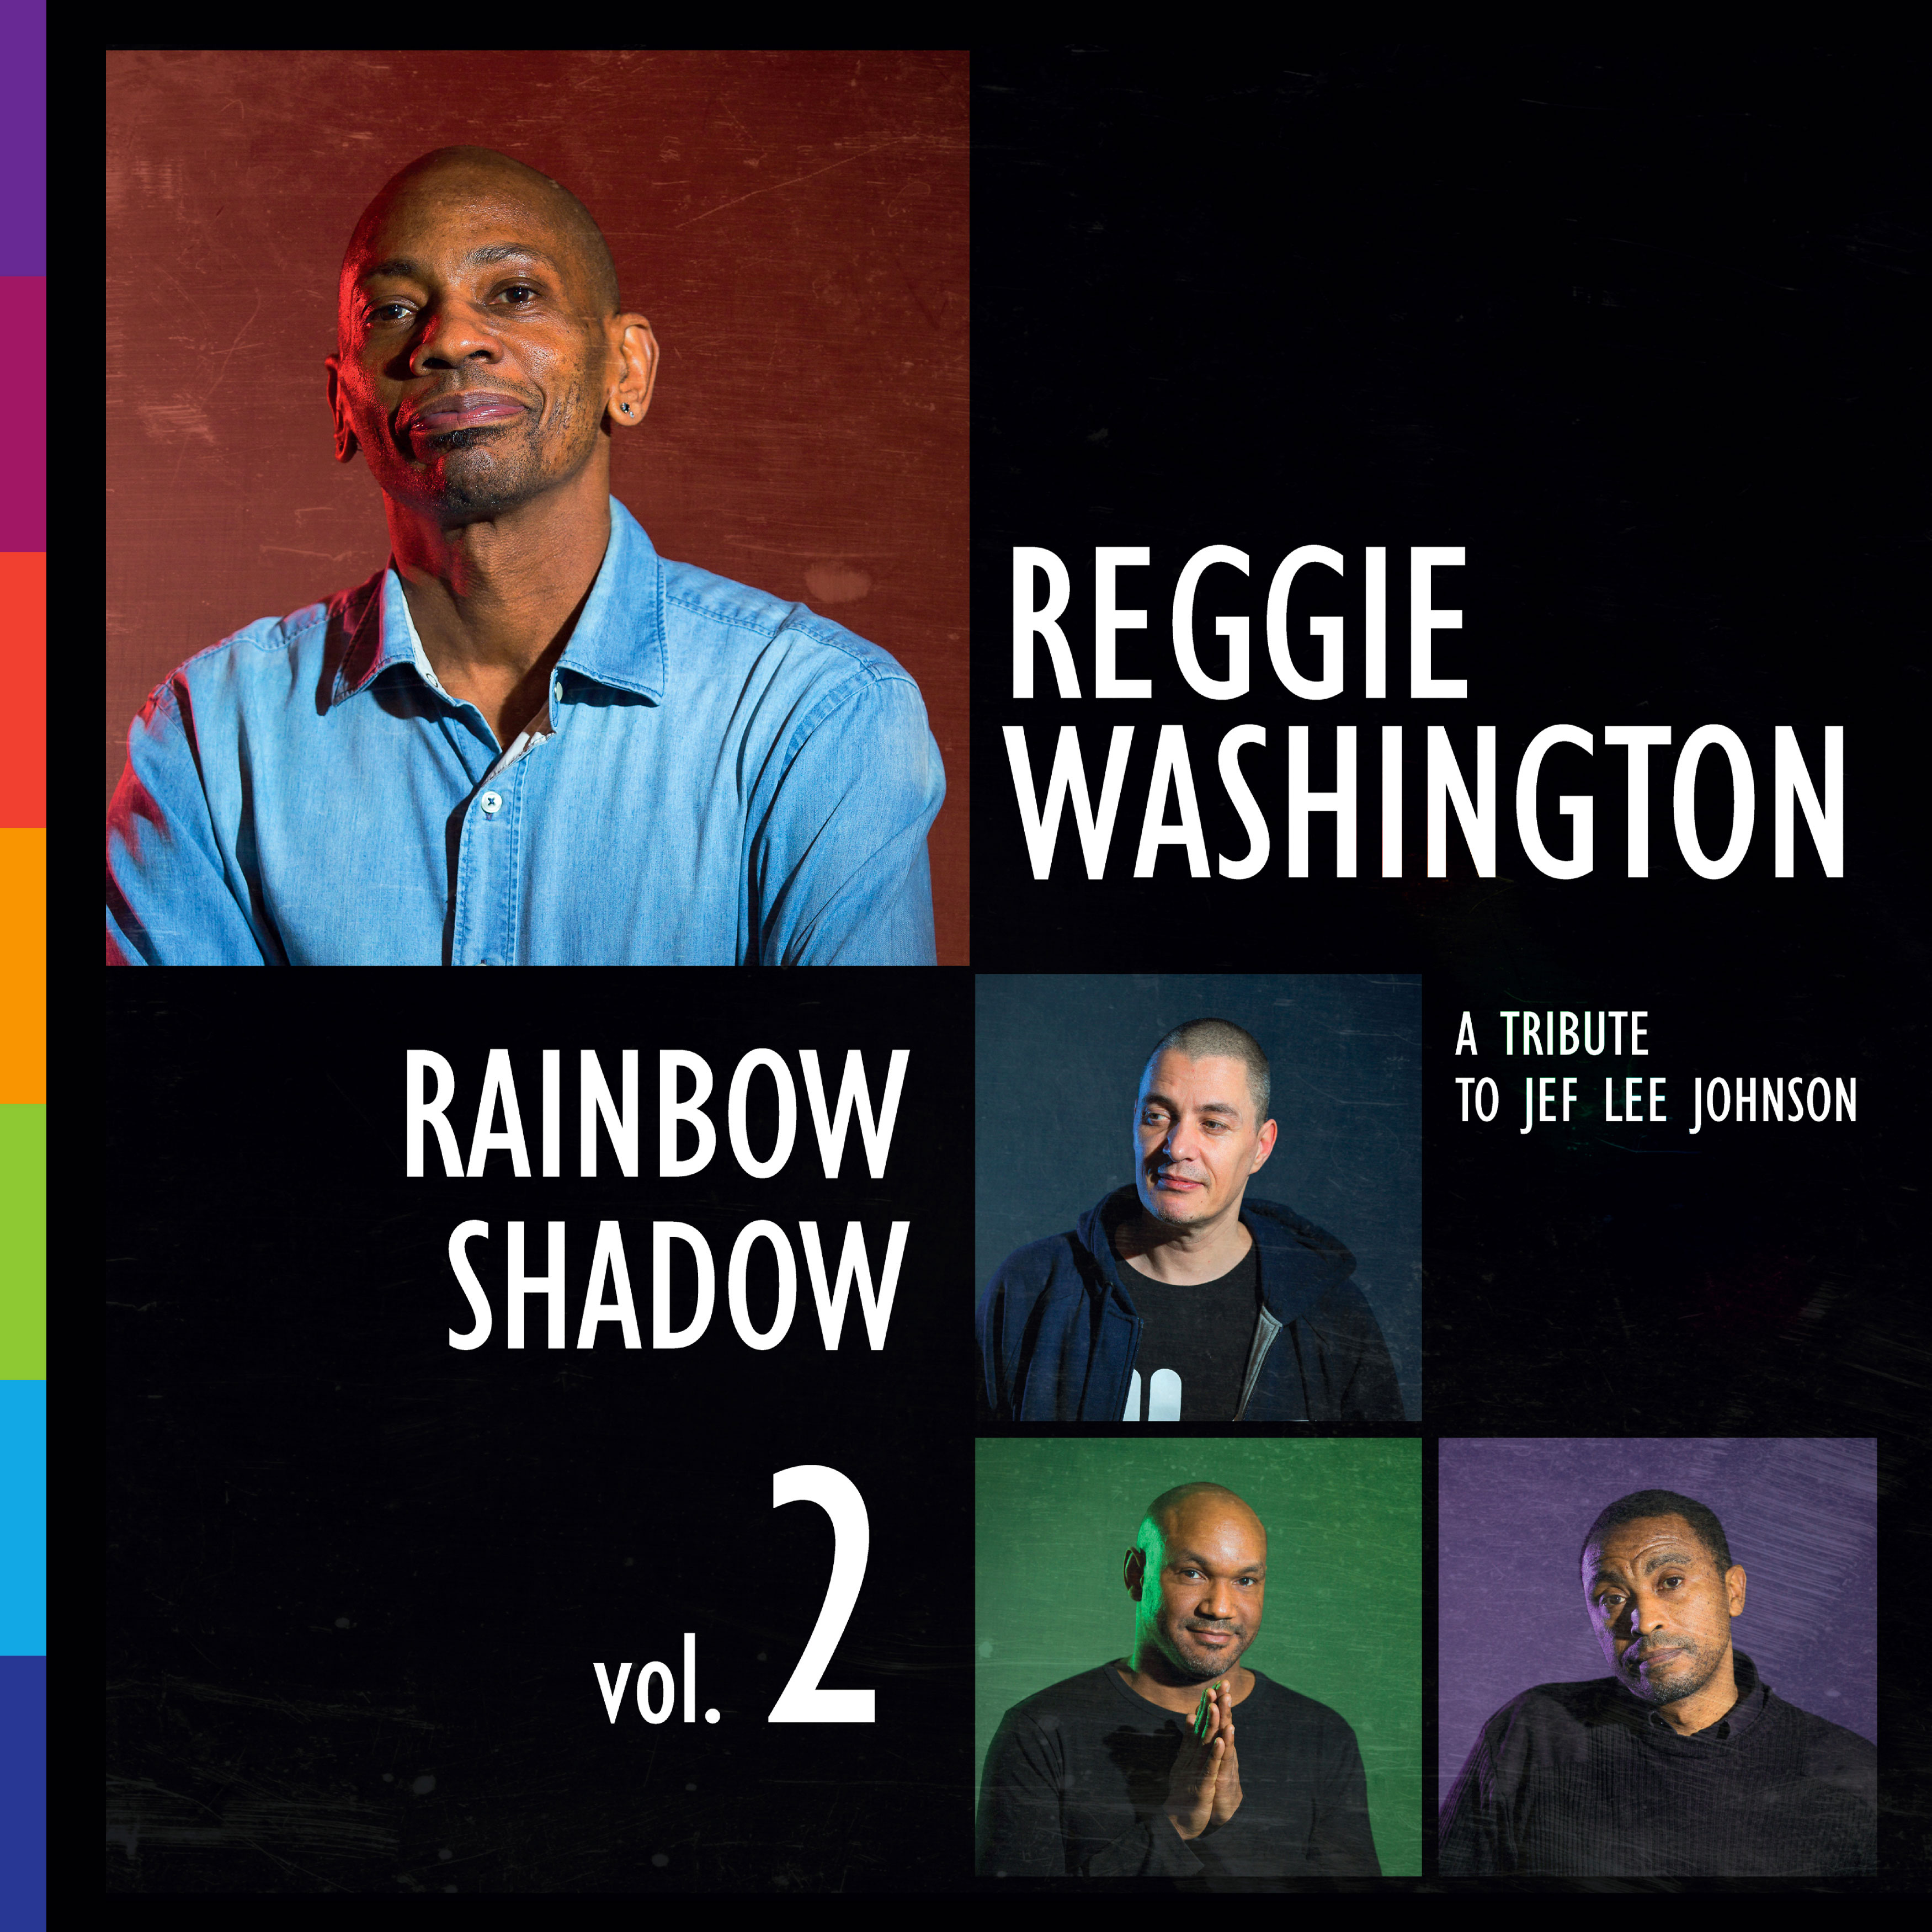 Reggie Washington - Rainbow Shadow Vol. 2 (Hi-Res Audio)